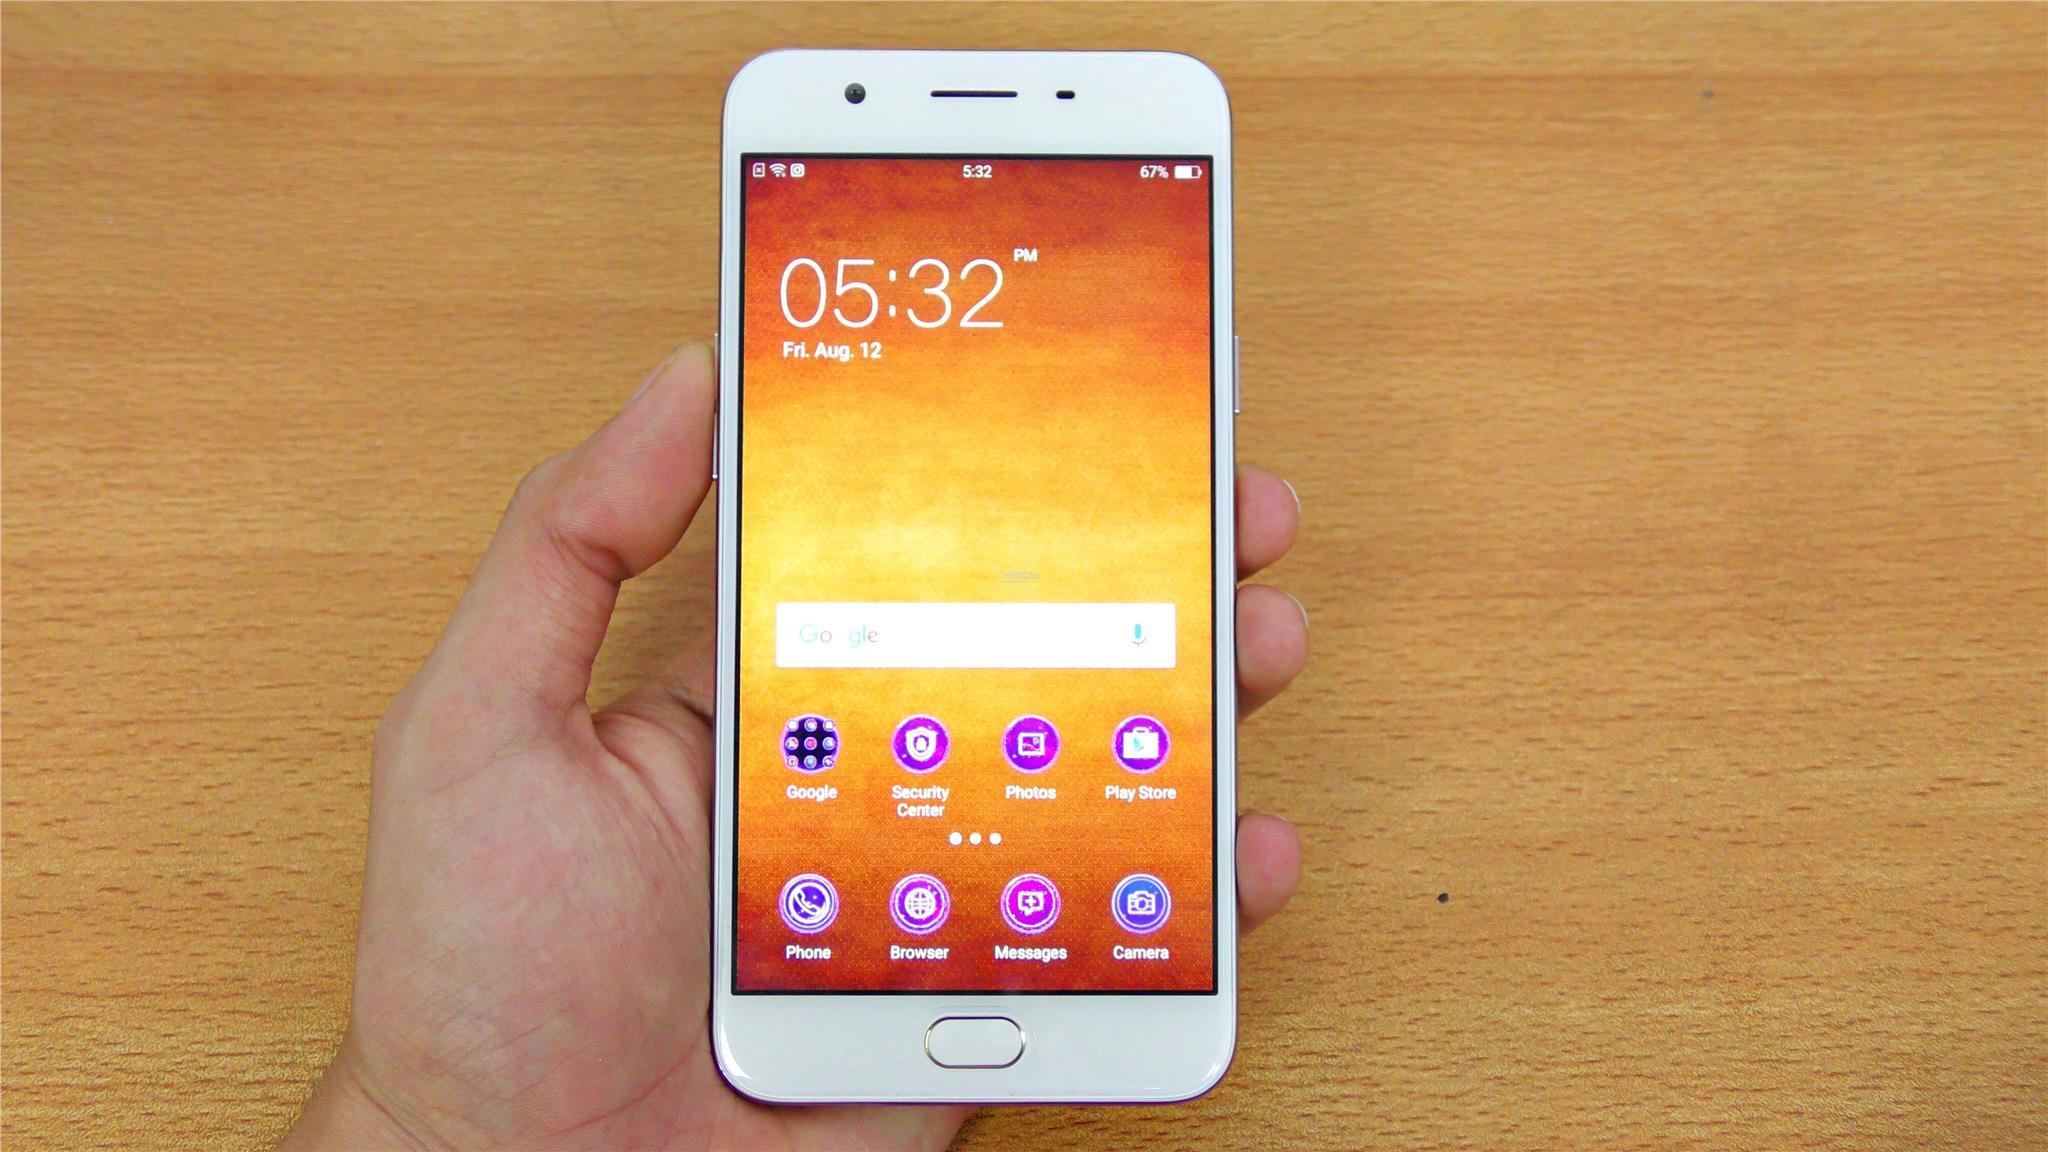 [Original Imported Set] OPPO F1s 3 32GB Selfie Expert Smartphone